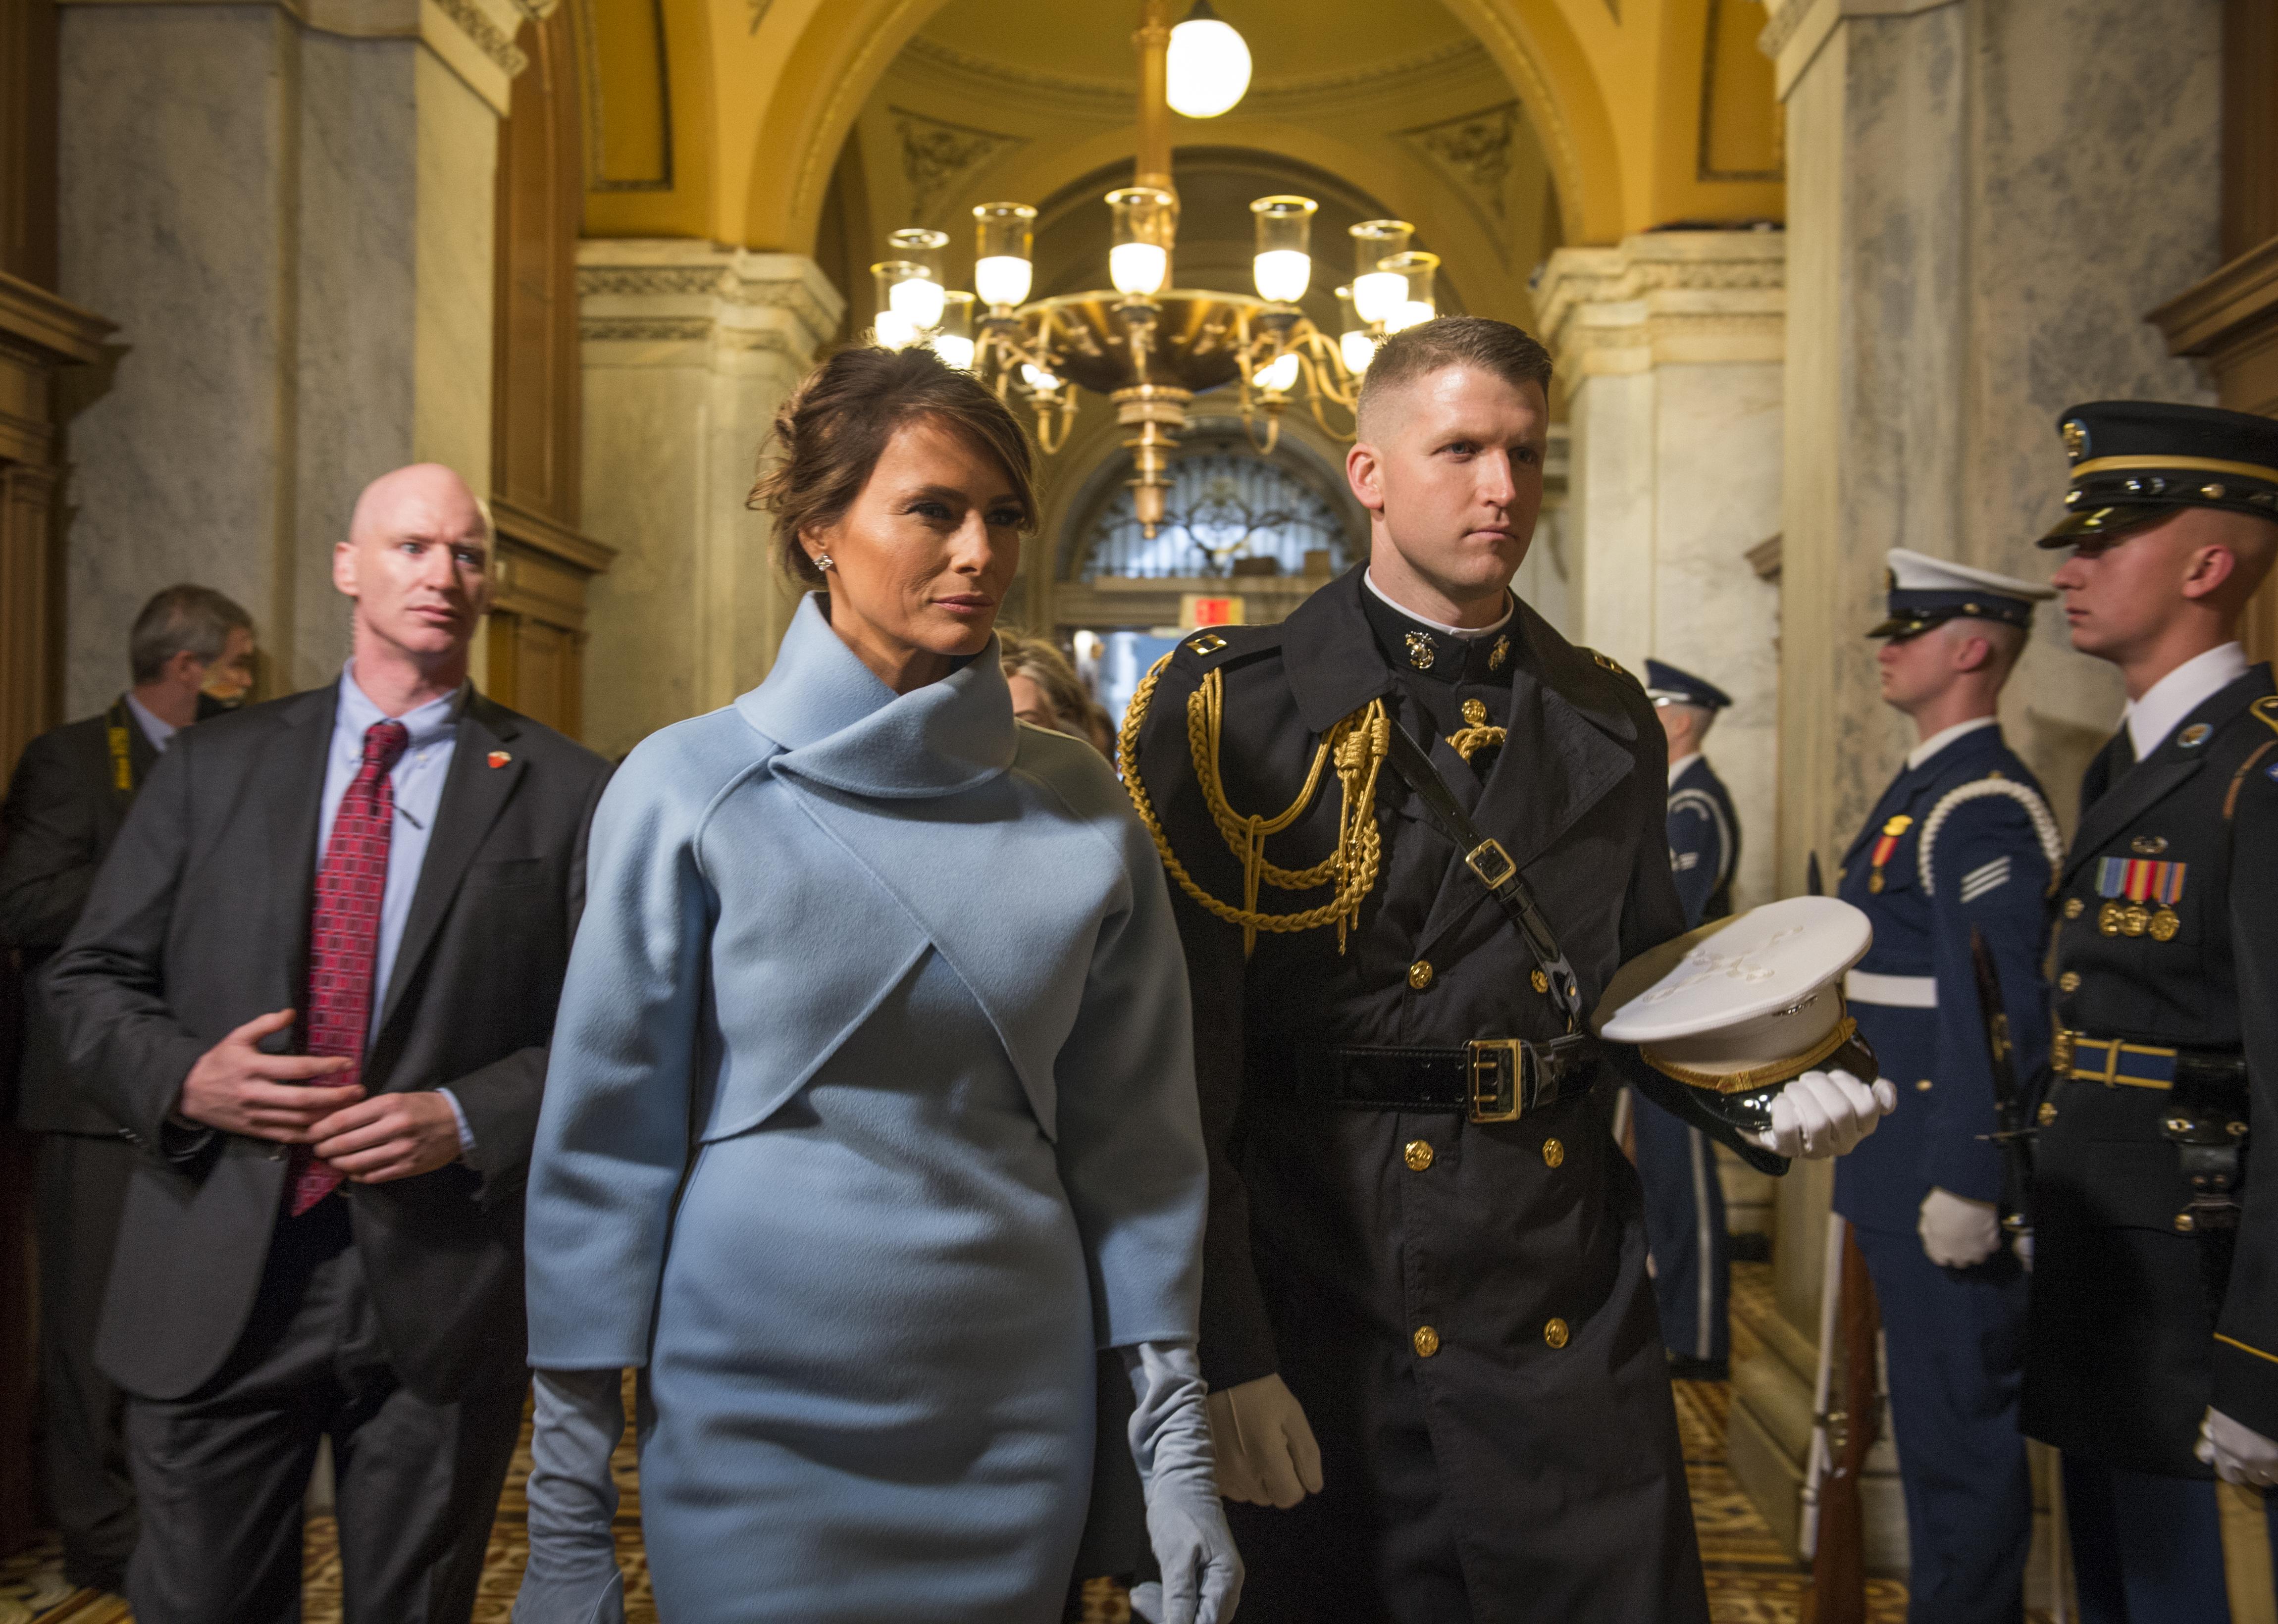 wiki filemelania trump escorted marine january